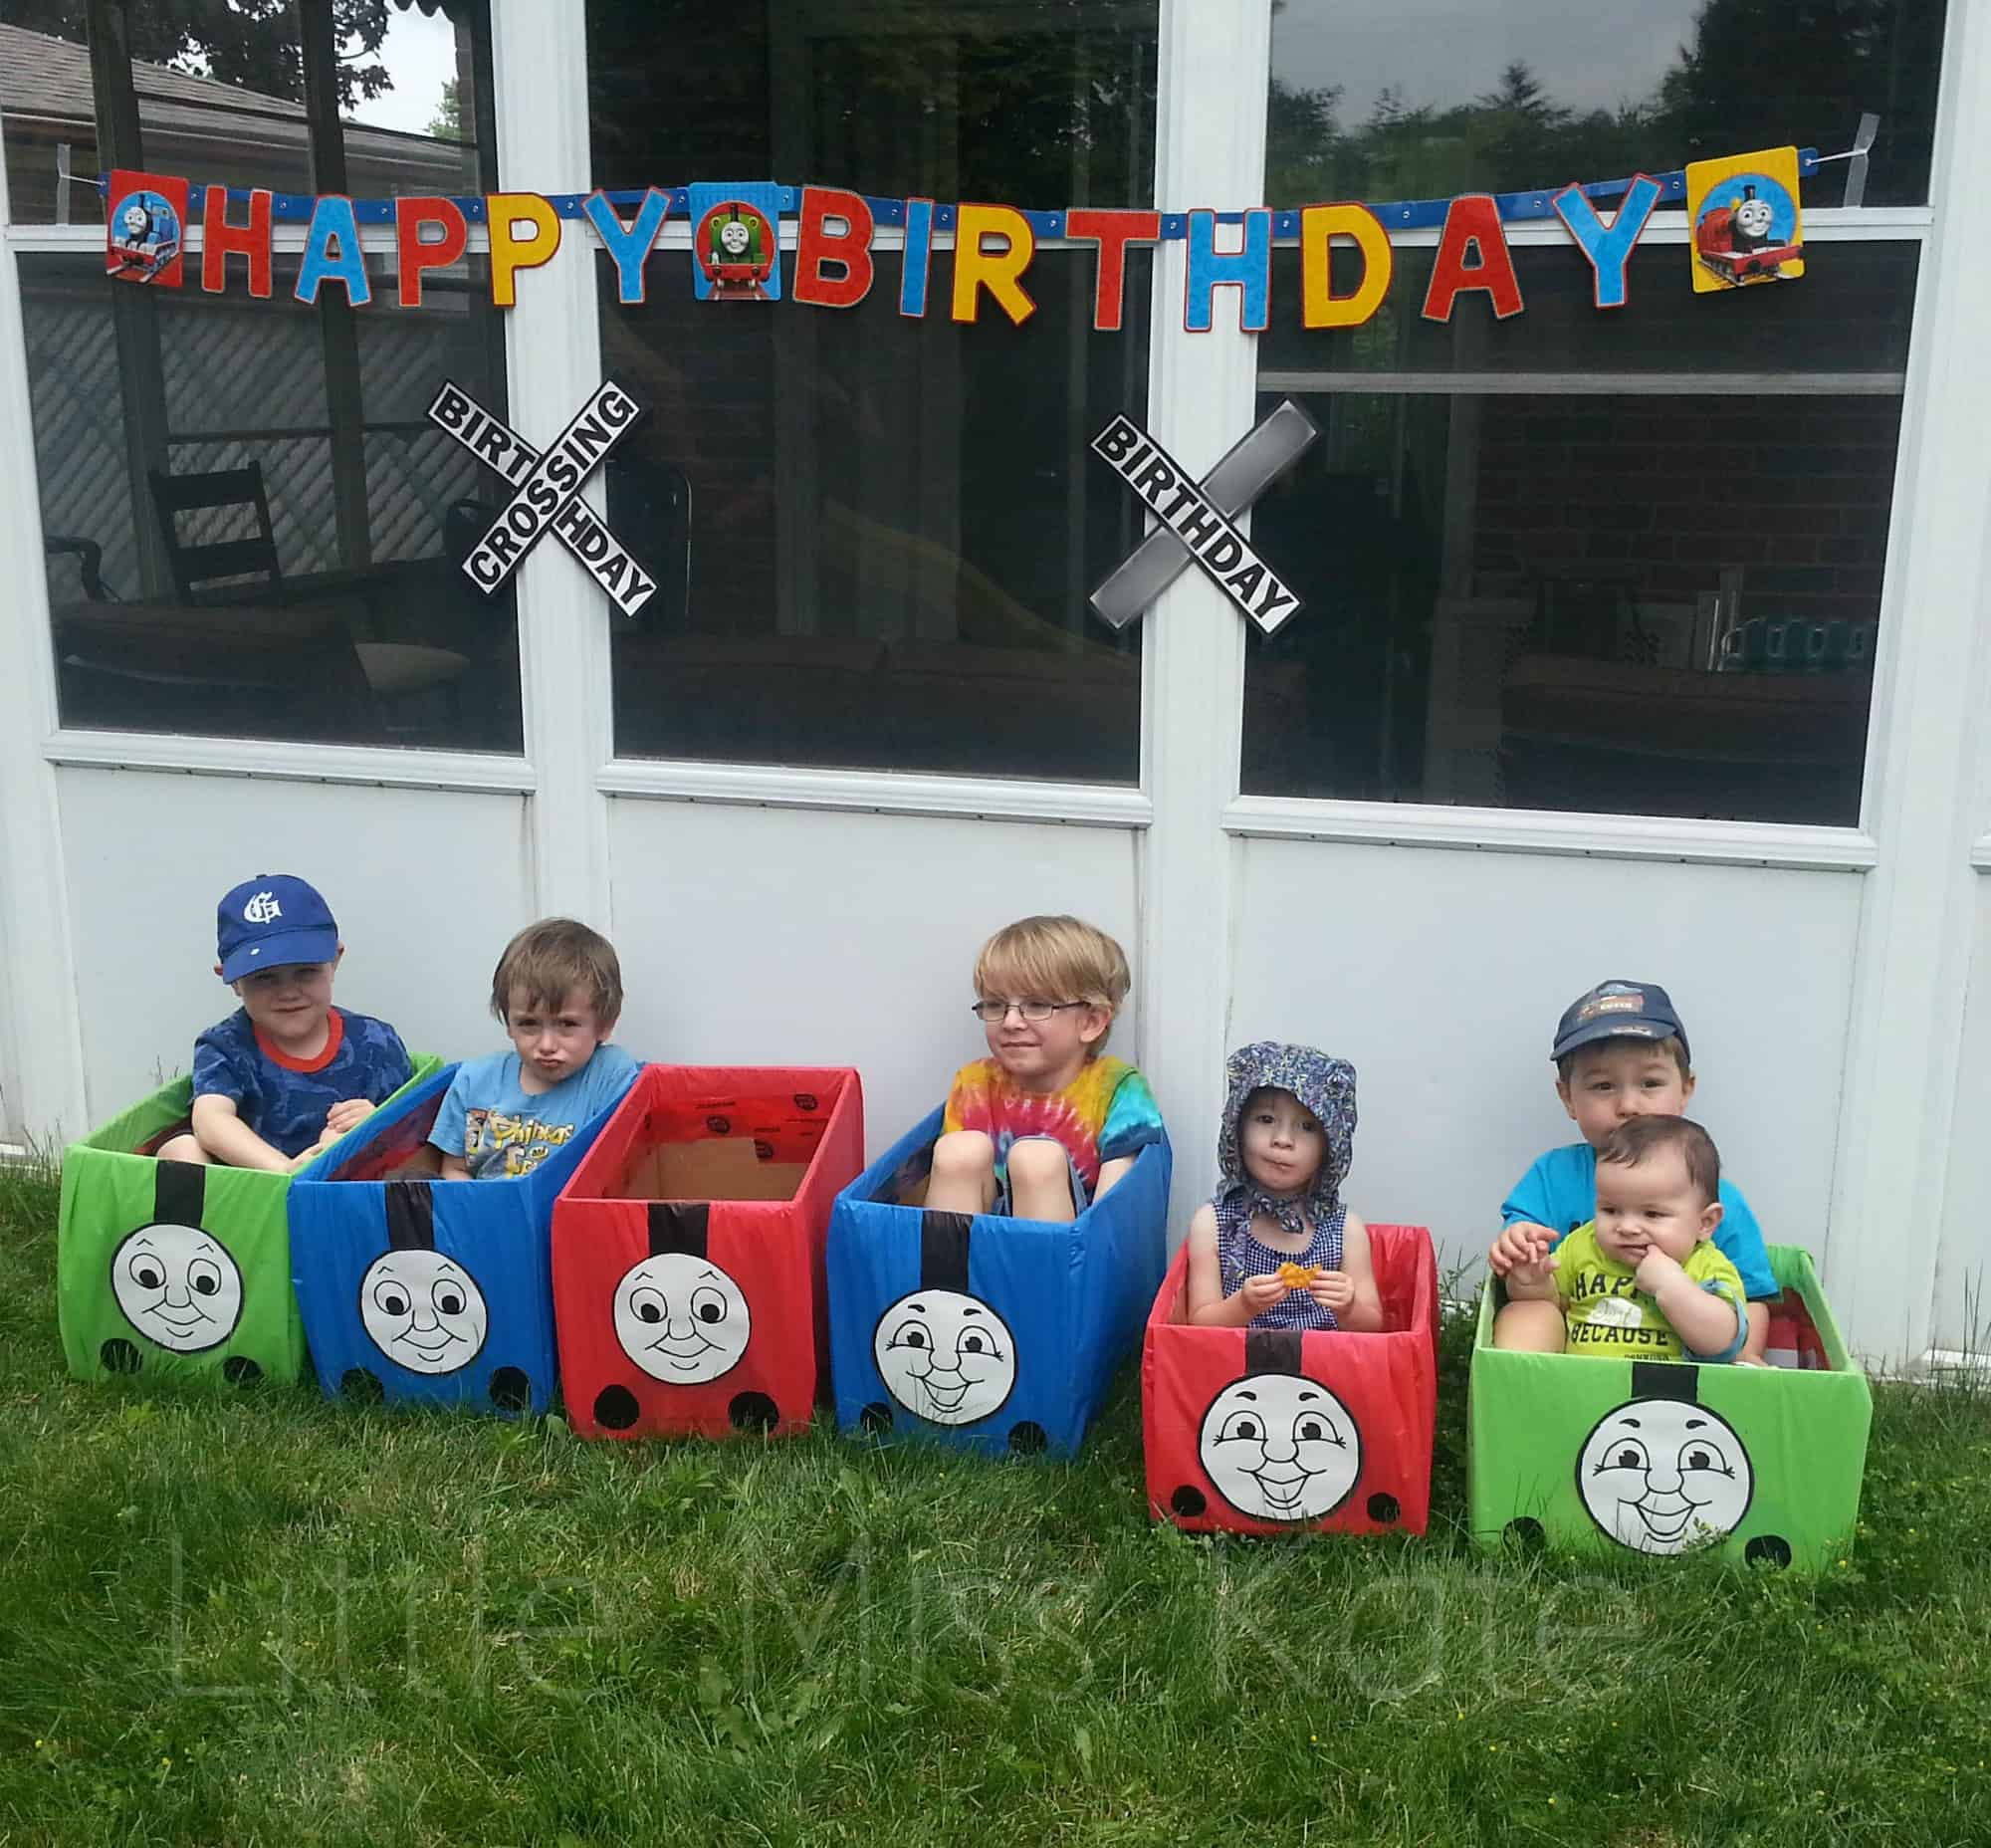 Kids Birthday Party Ideas: Thomas the Train Party Ideas - Little Miss Kate